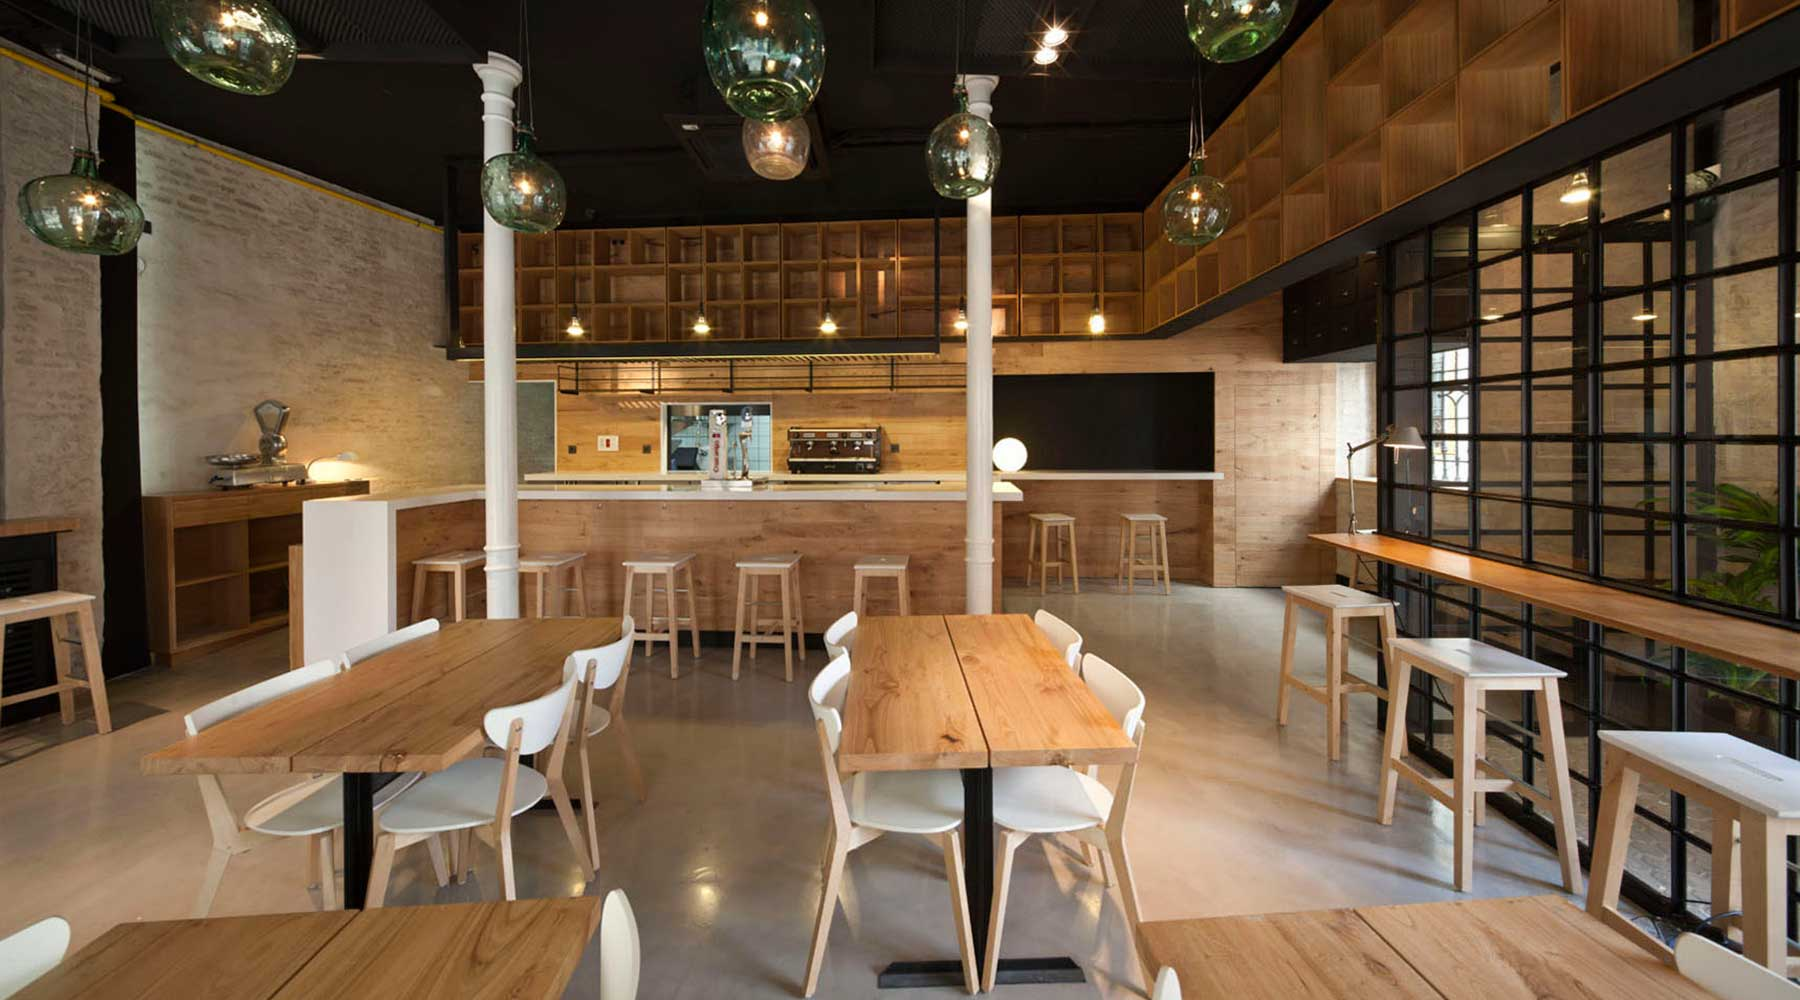 Acabado interior de mobiliario para bar